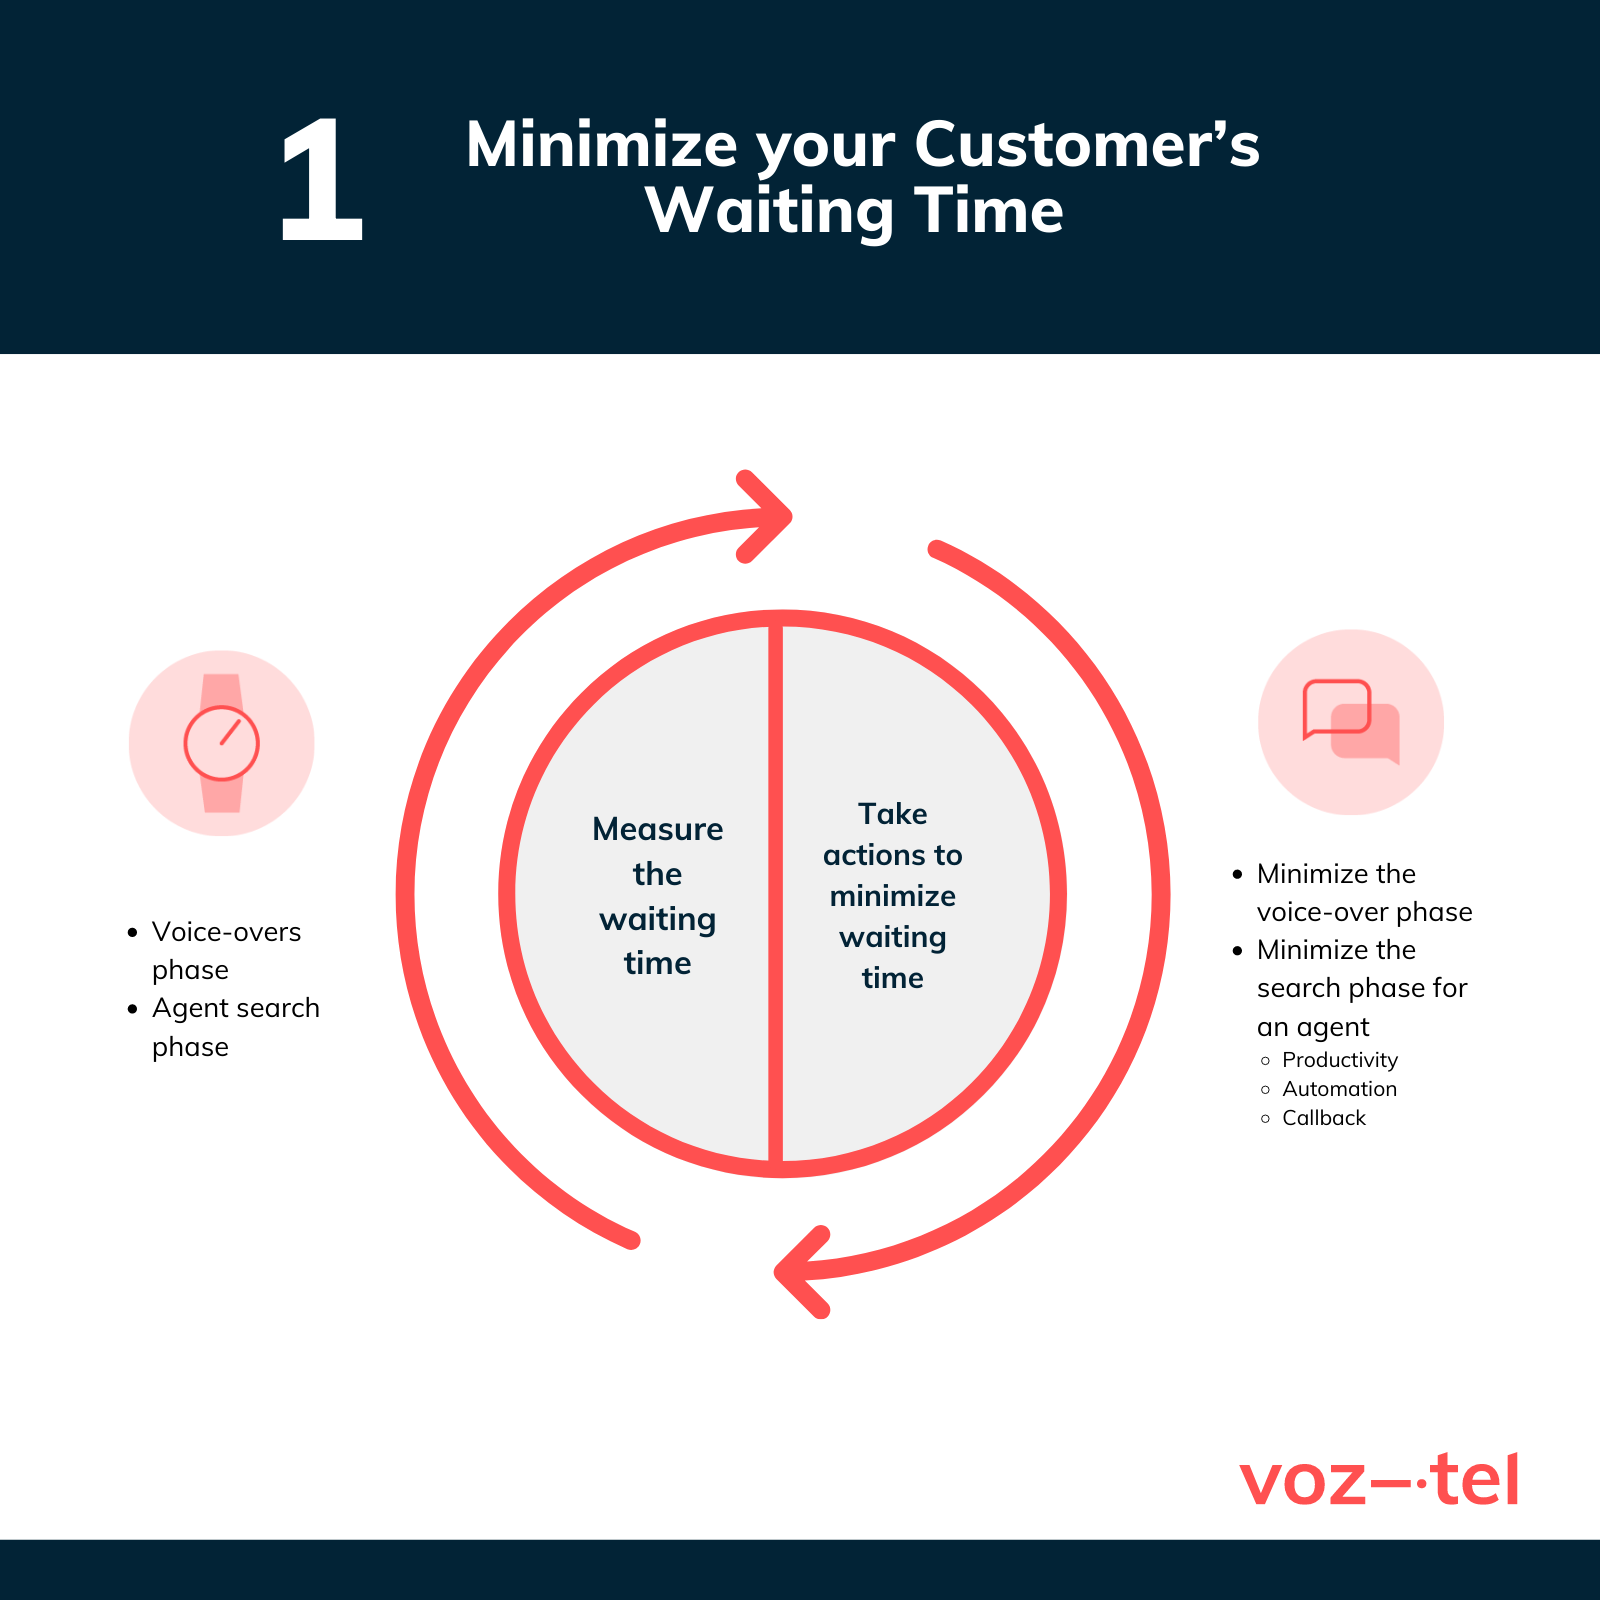 Minimize customer's waiting time